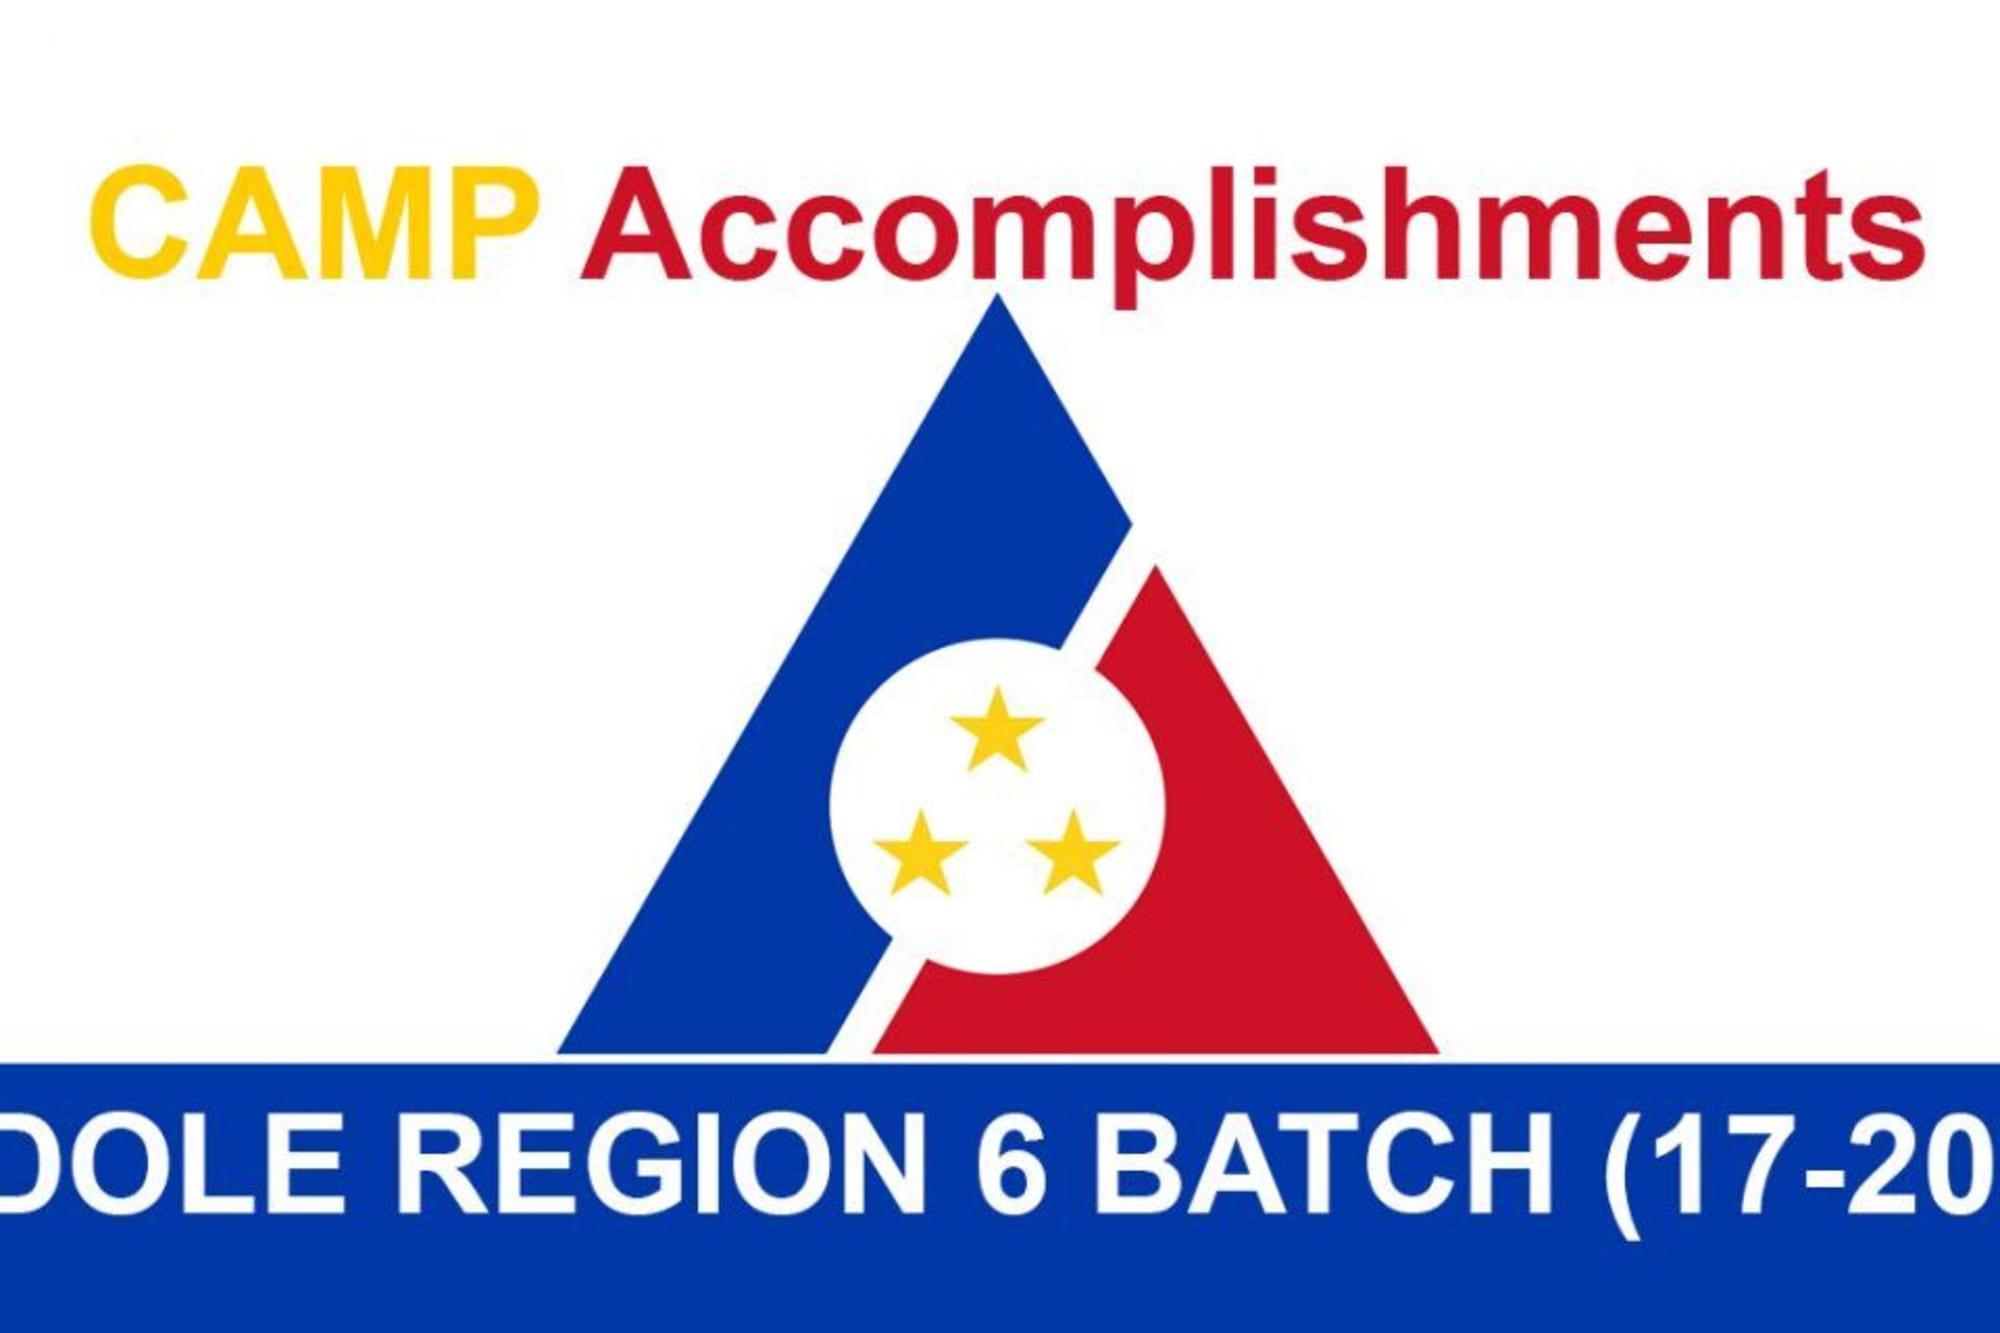 DOLE REGION 6 CAMP Accomplishments Batch (17-20); Alphabetical Order of list of companies